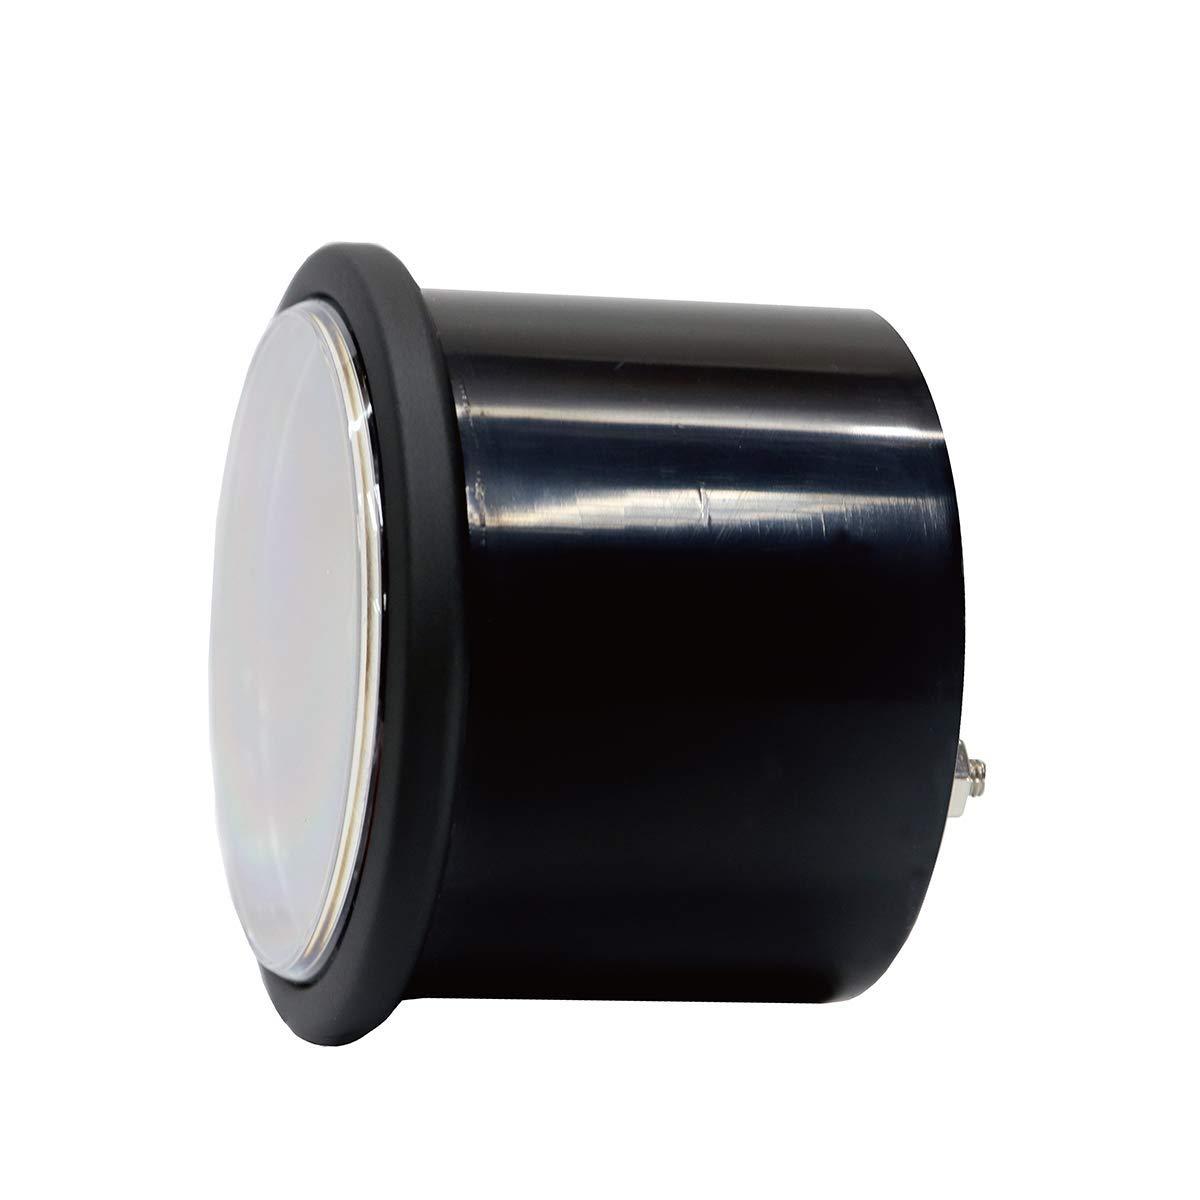 MOTOR METER RACING 2-1//16 52mm Universal Pyrometer Exhaust Gas Temp Gauge Black Dial Clear Lens White Led 2000 F